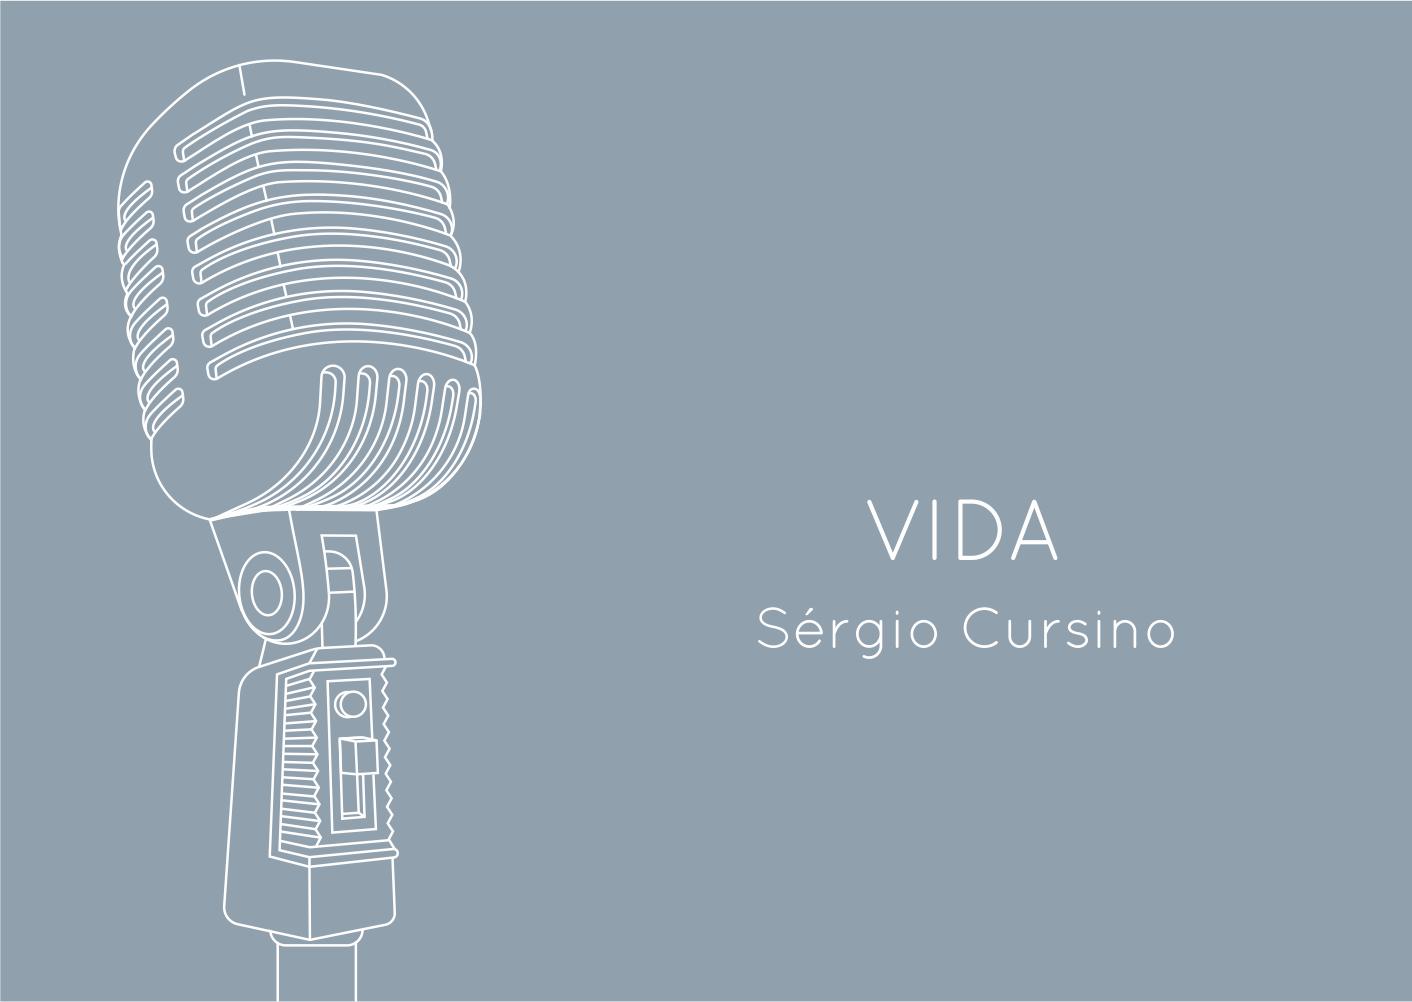 Vida - Sérgio Cursino